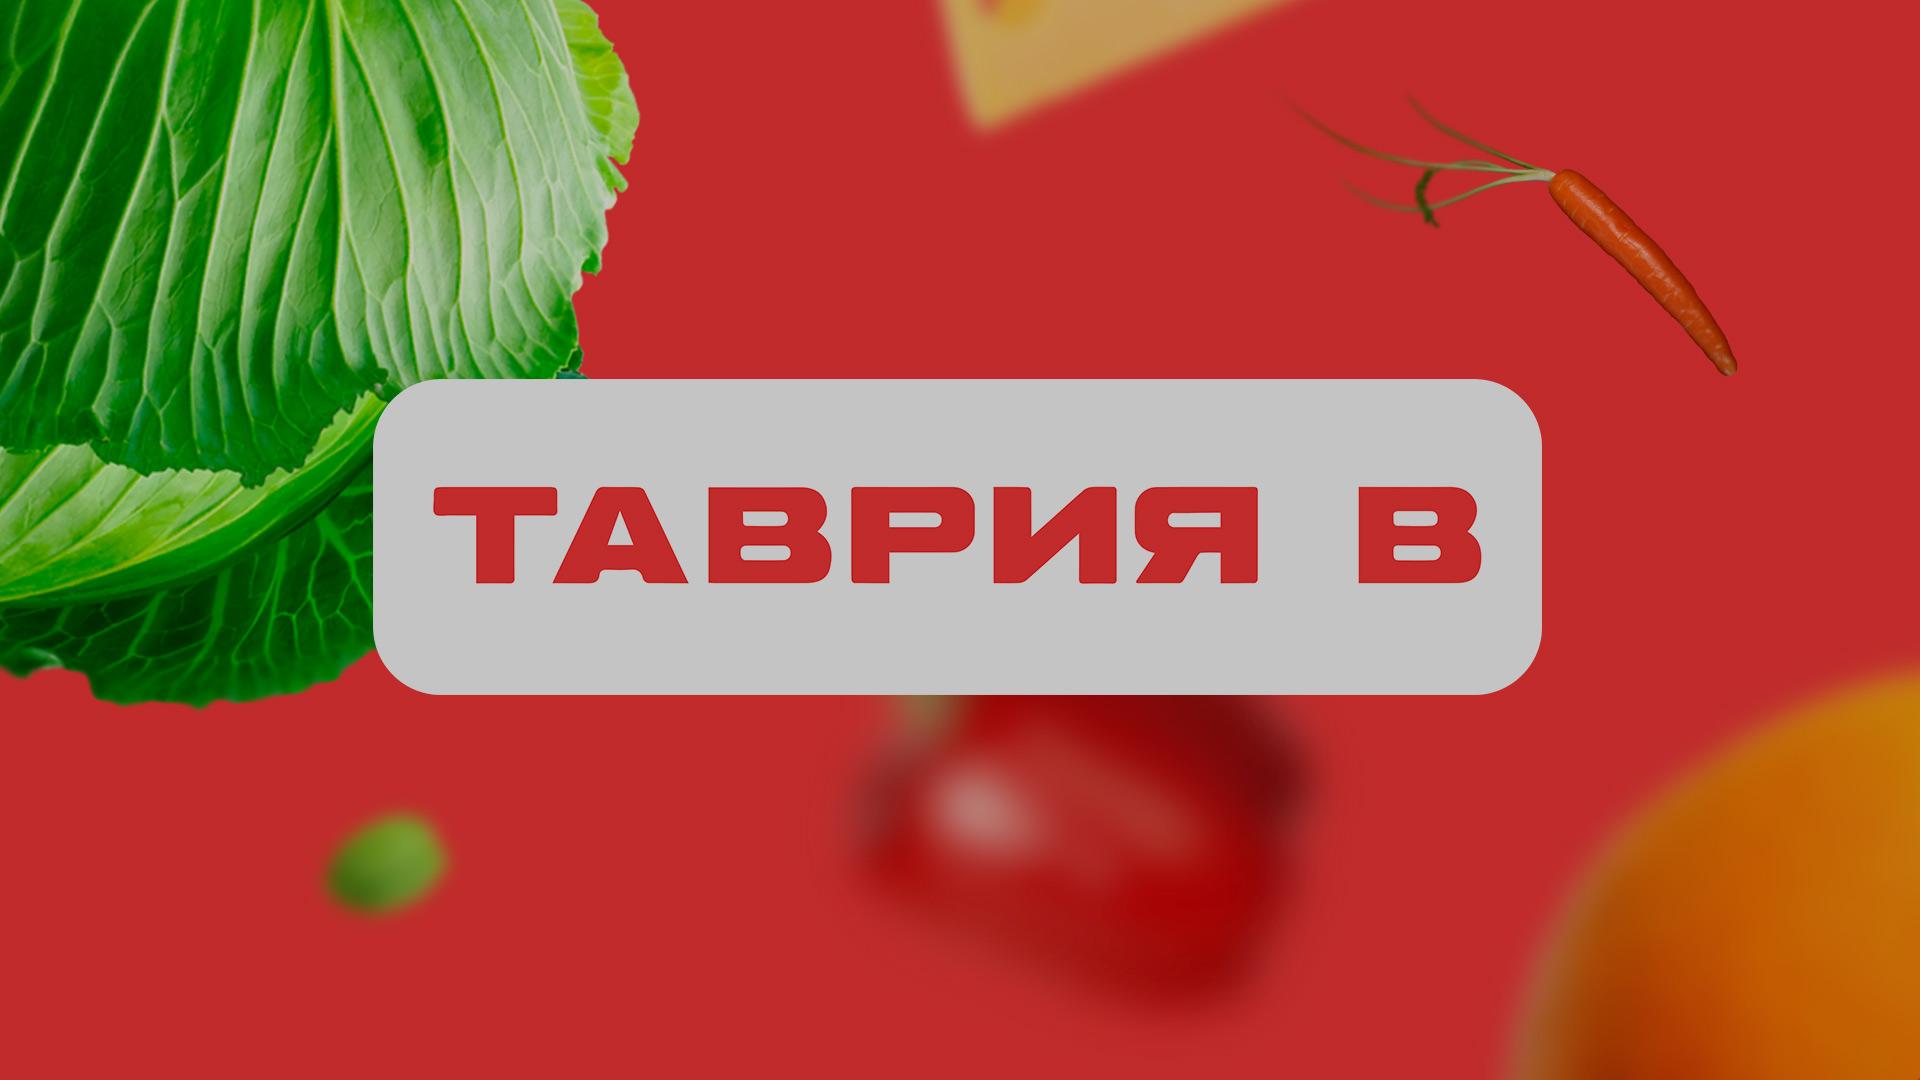 Таврия В